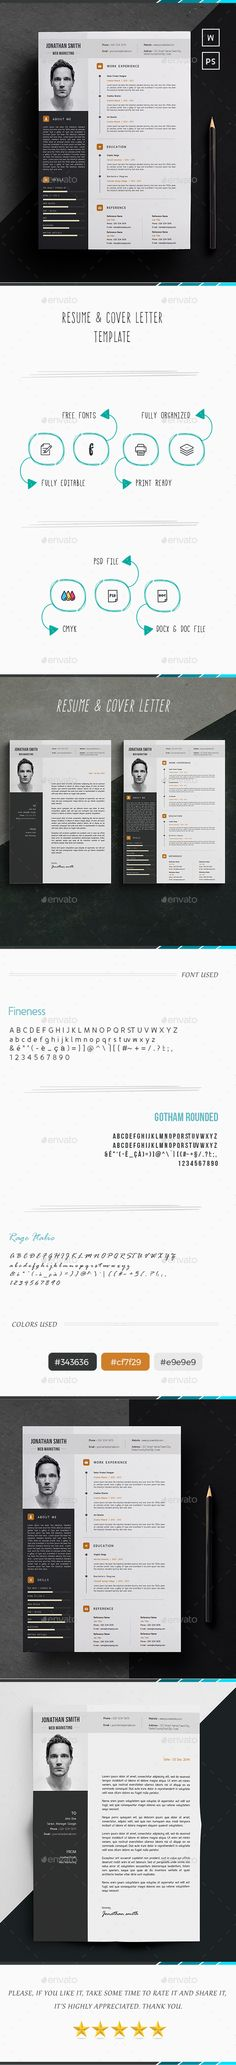 Infographic Resume\/Cv Volume 7 Infographic resume, Resume cv and - web resume templates